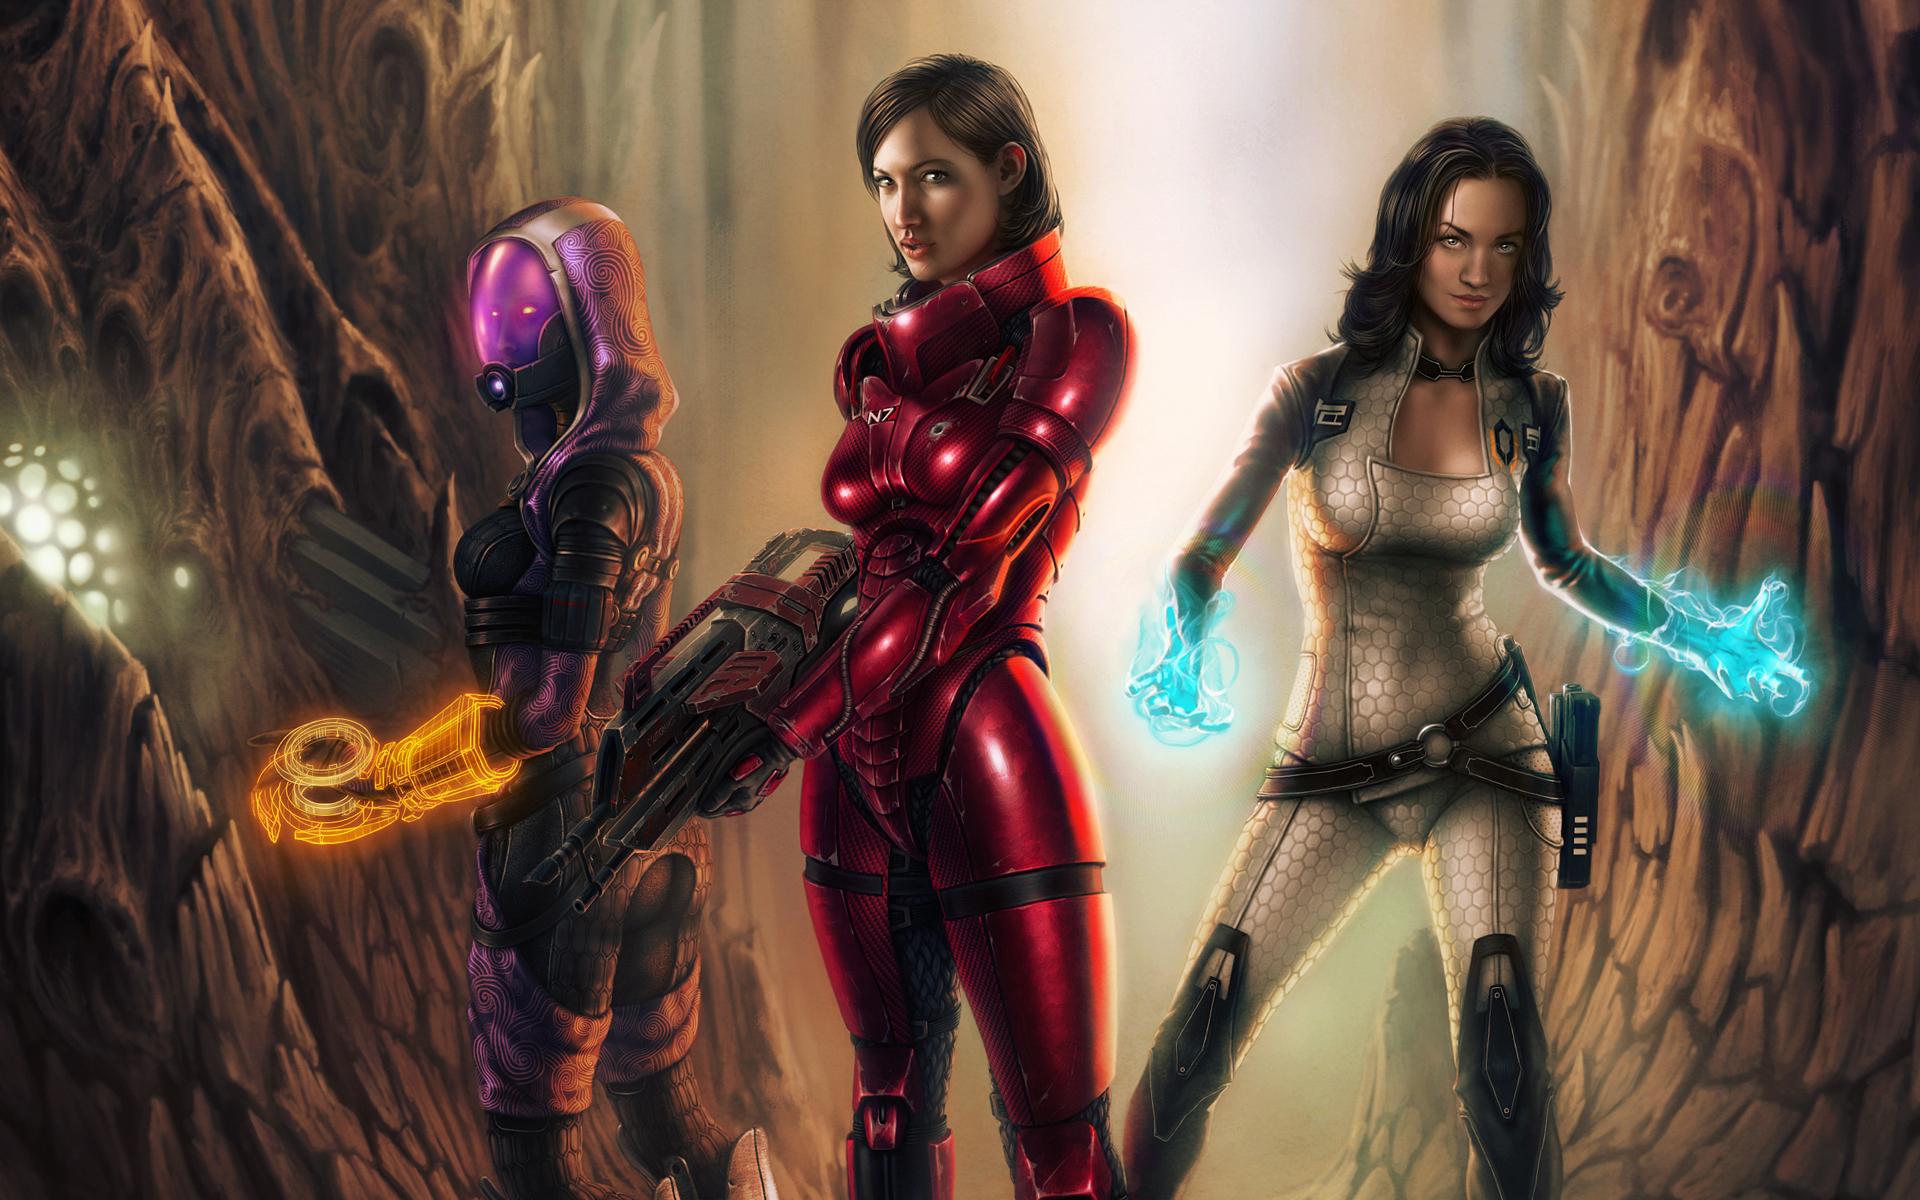 Mass Effect 2 Hd Wallpaper Background Image 1920x1200 Id